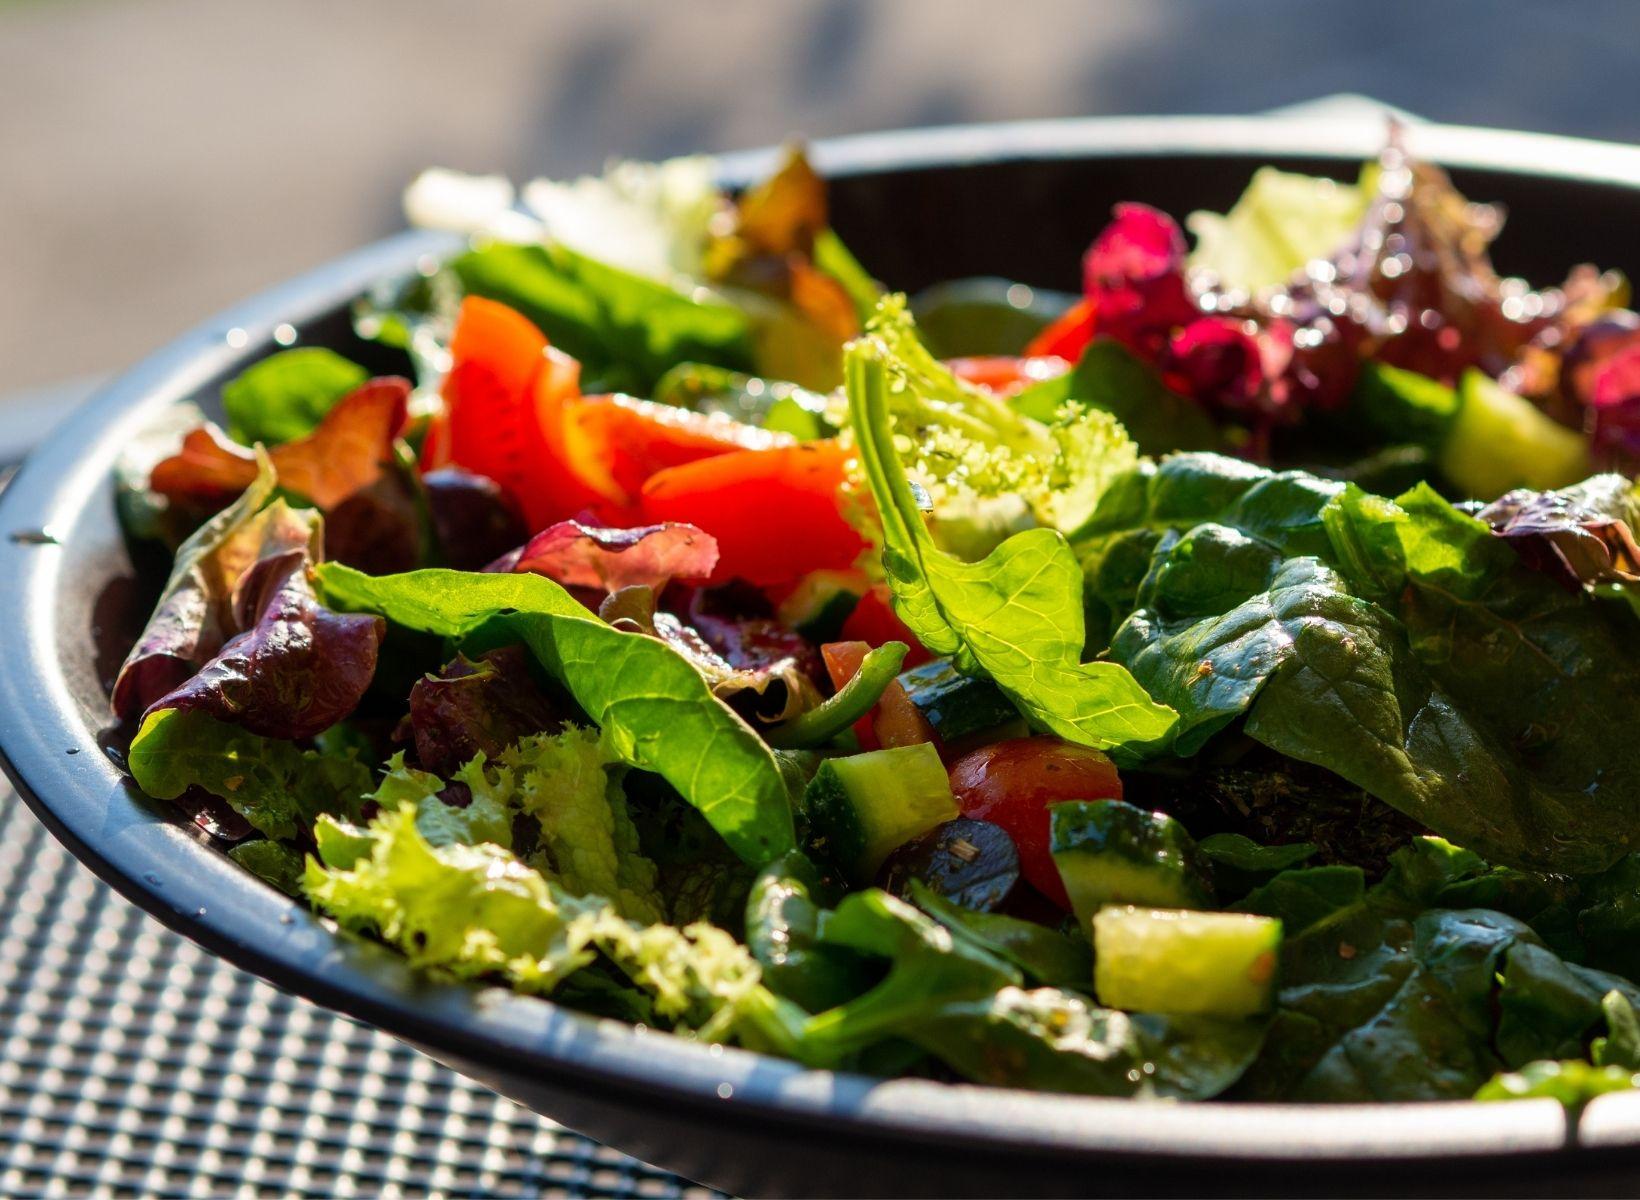 A closeup shot of a black plate piled with Italian chicken mason jar salad